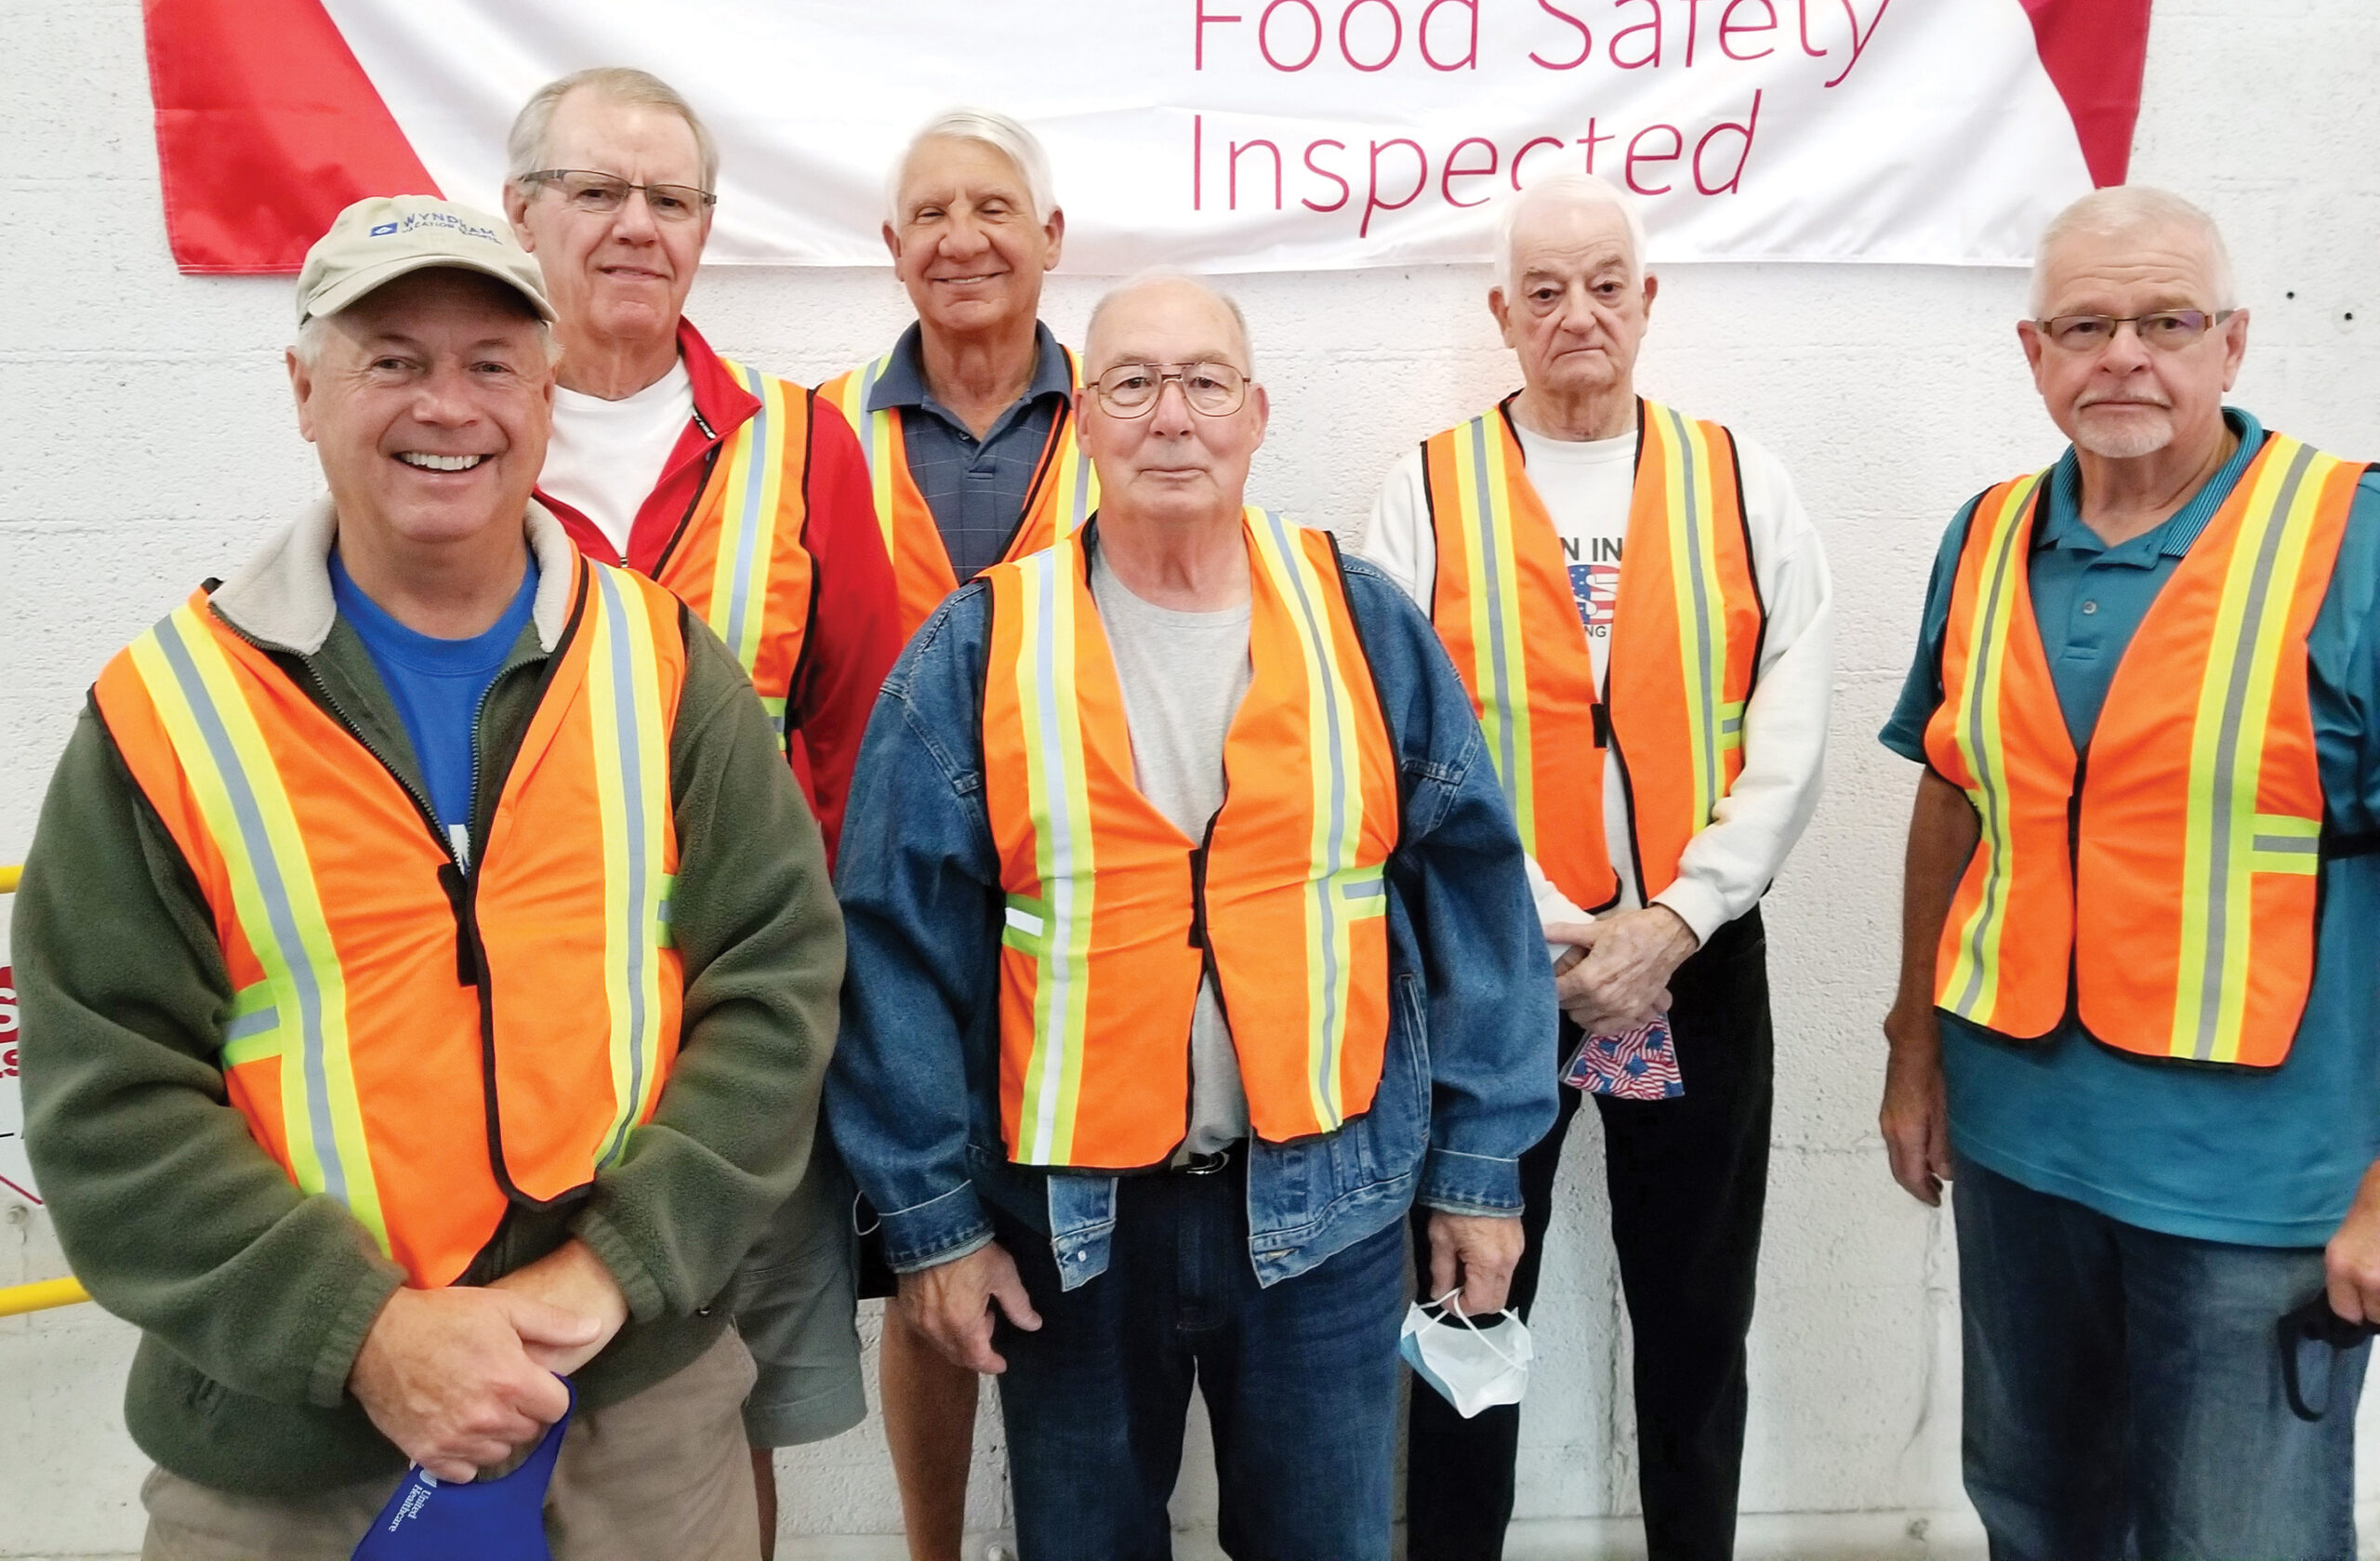 From left to right are: Jim Sykes, Richard Margison, Joe Scarnato, Joe Davis, Fred Cochran, and Neil Smith